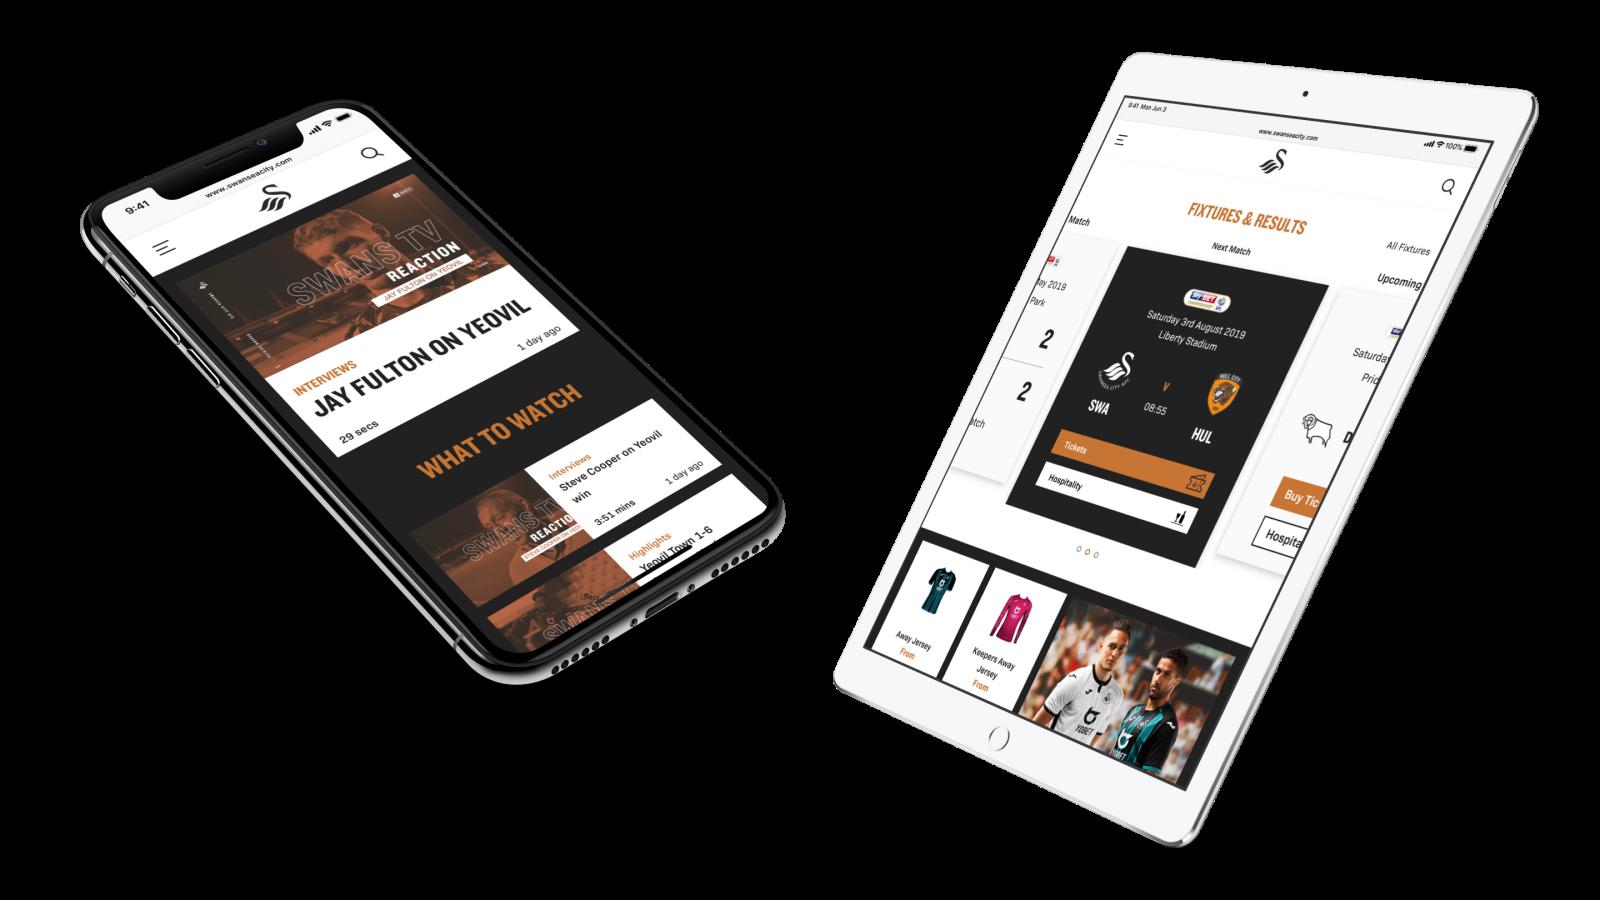 Swansea City Fc App Website Other Media